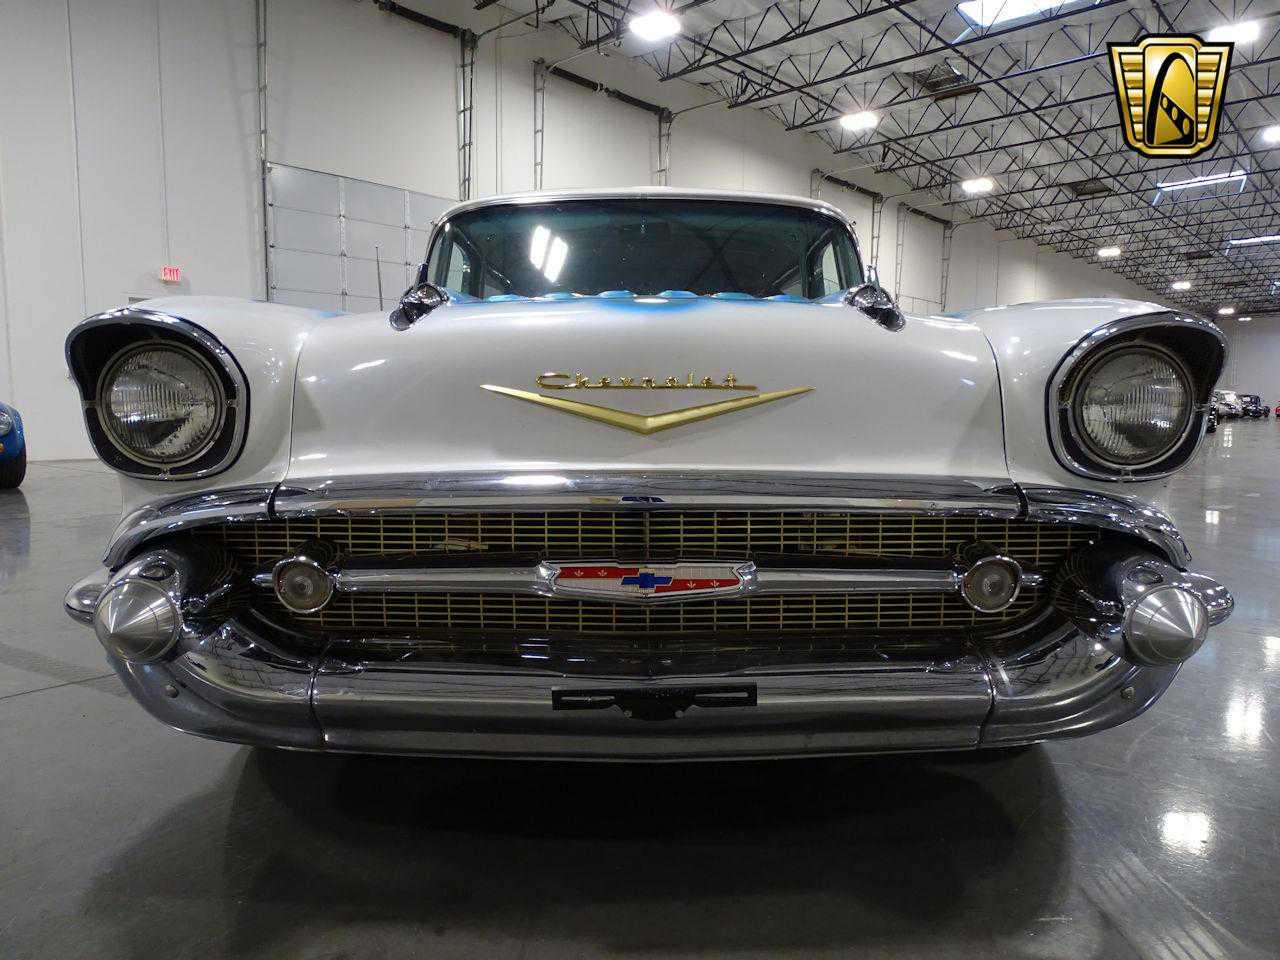 1957 Chevrolet Nomad For Sale In Deer Valley Az Gccsct173 Interior Prev